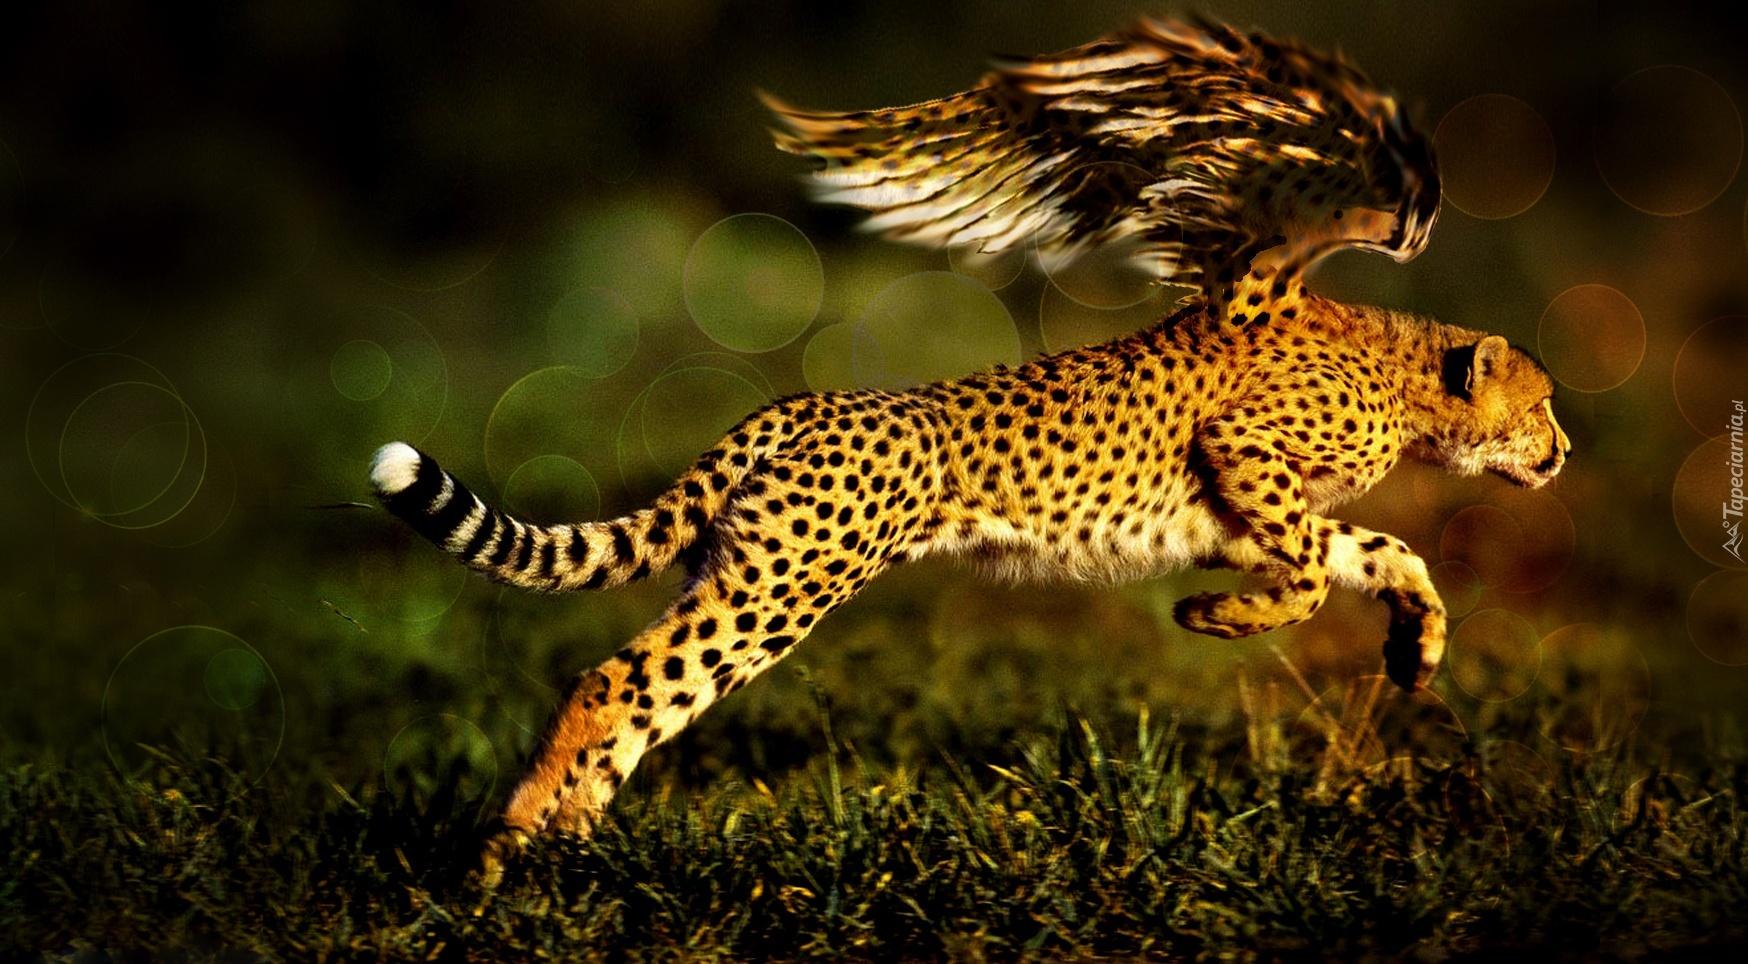 Leopard 4k Black Background Hd Animals 4k Wallpapers: Gepard, Ptak, Bieg